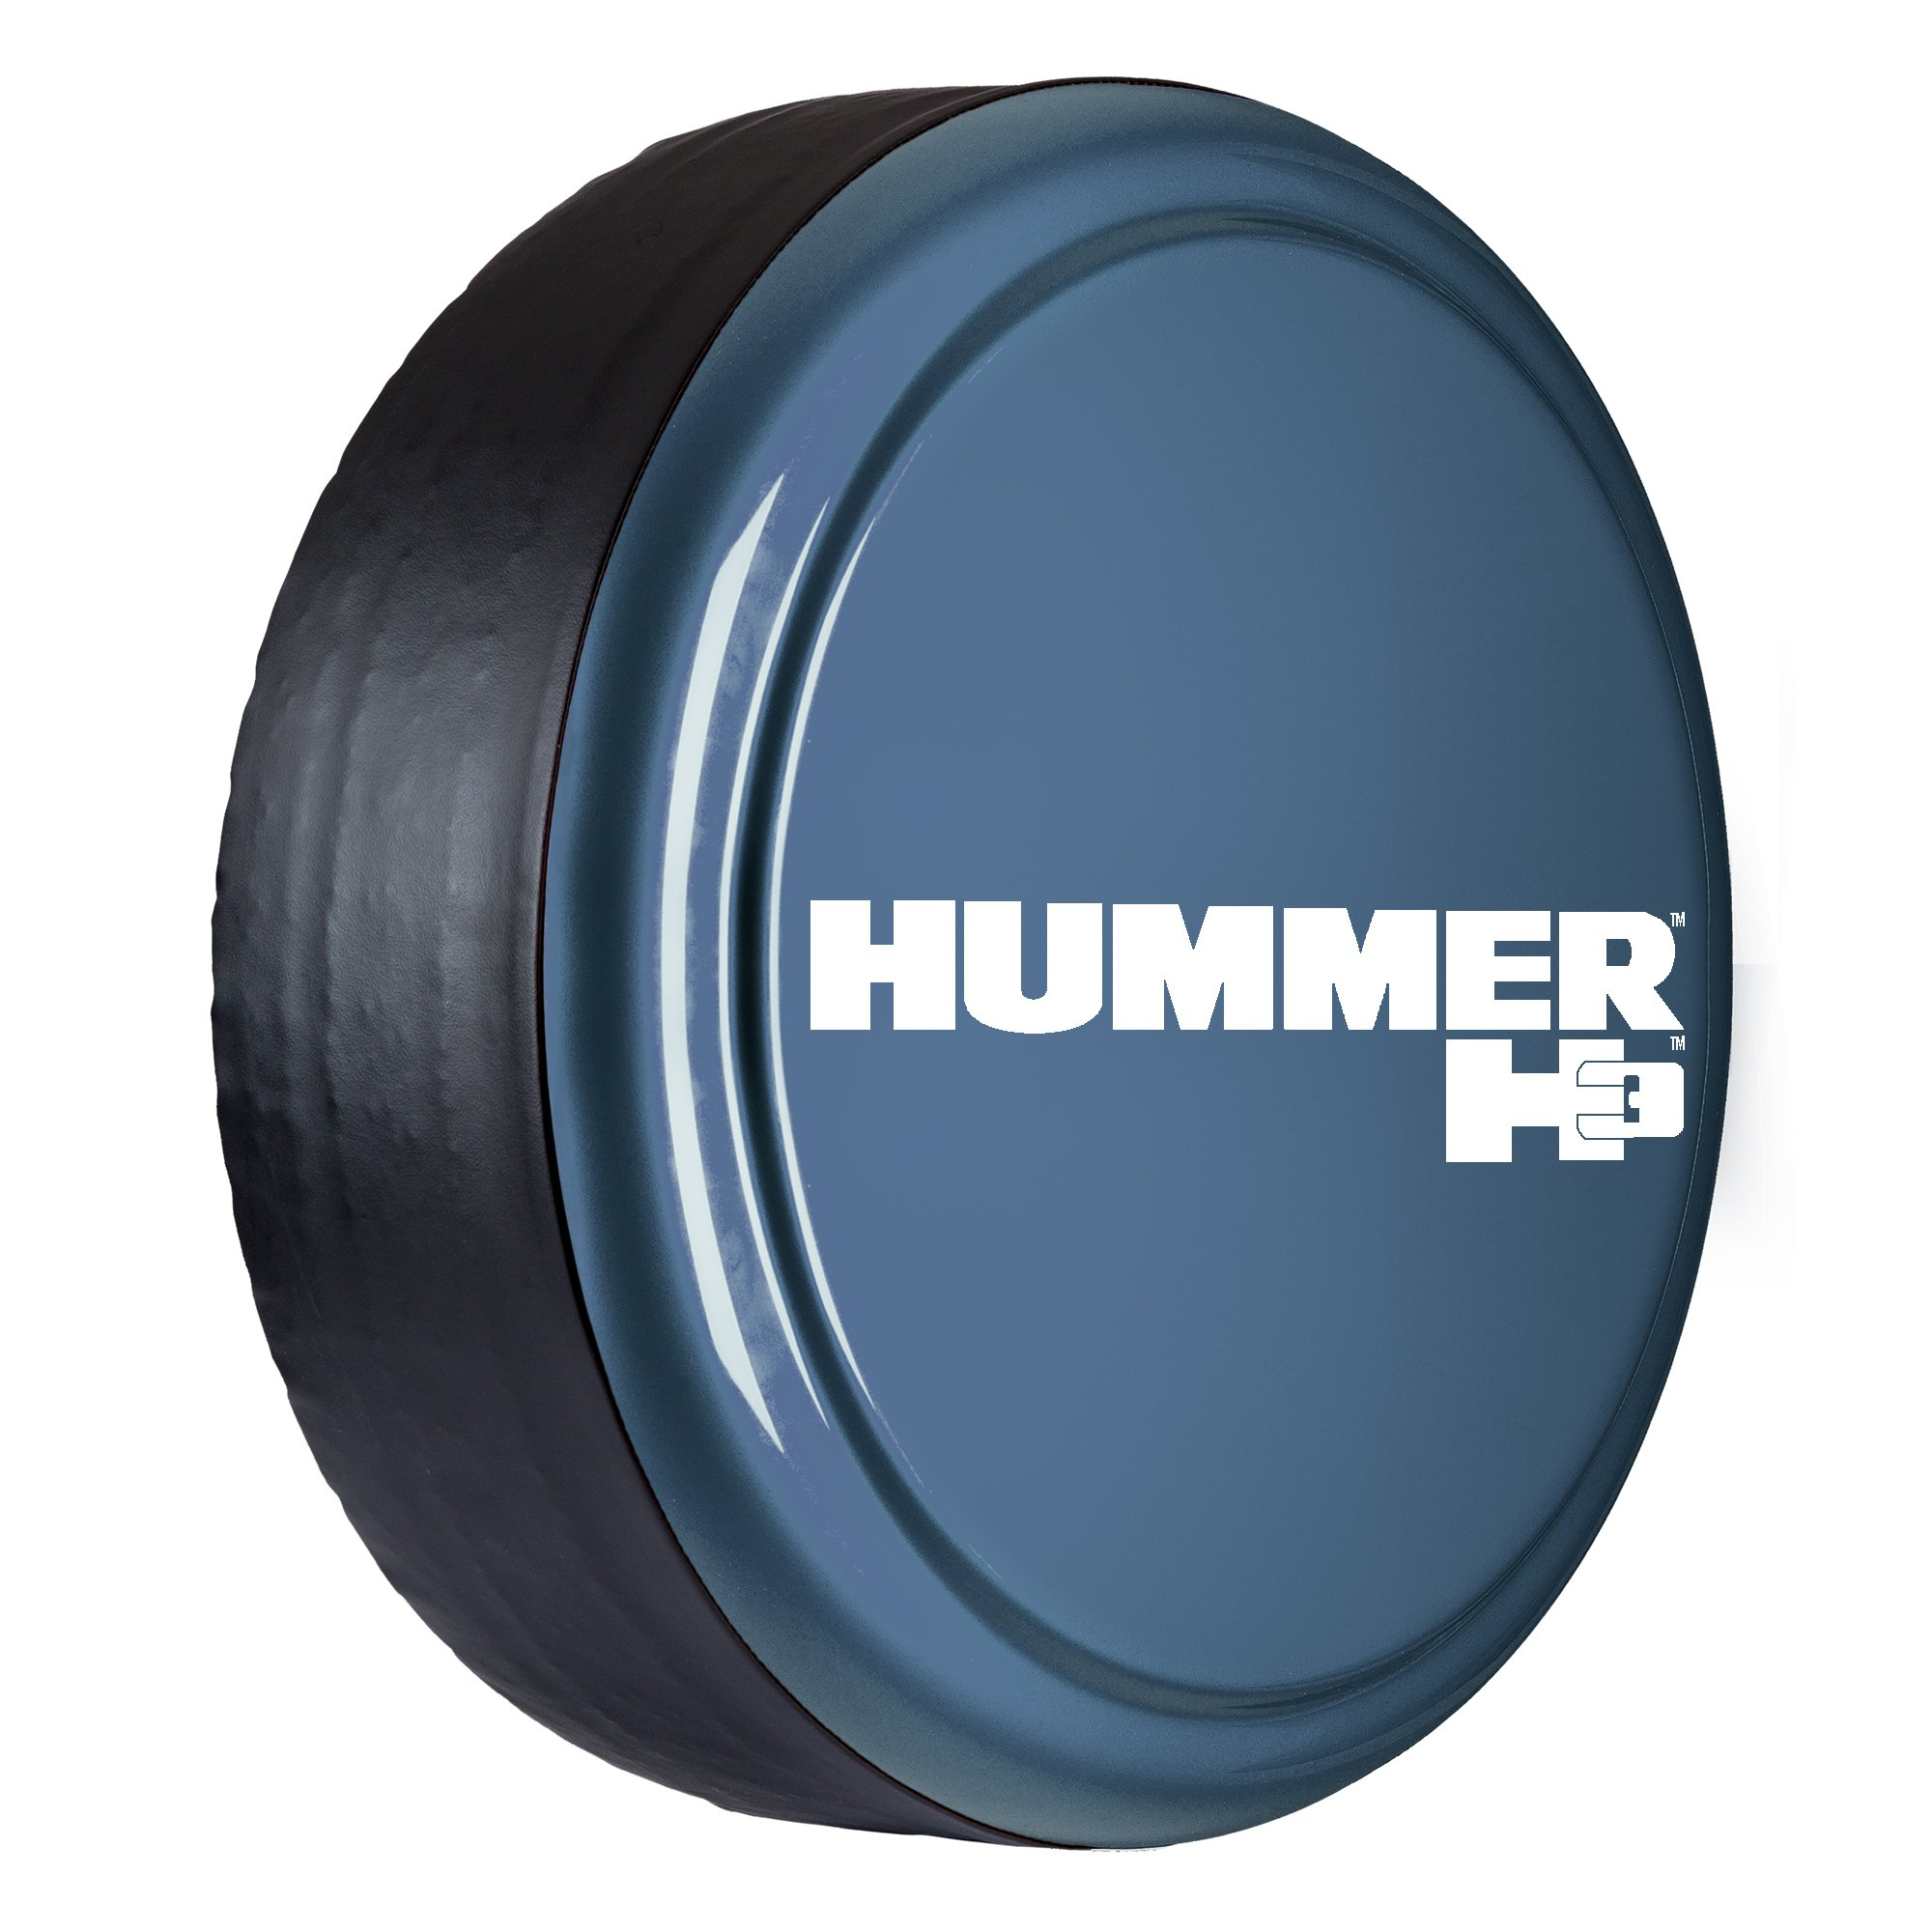 Hummer H3 - 33'' Color Matched Rigid Tire Cover - (Hard Plastic Face & Vinyl Band) - Slate Blue Metallic